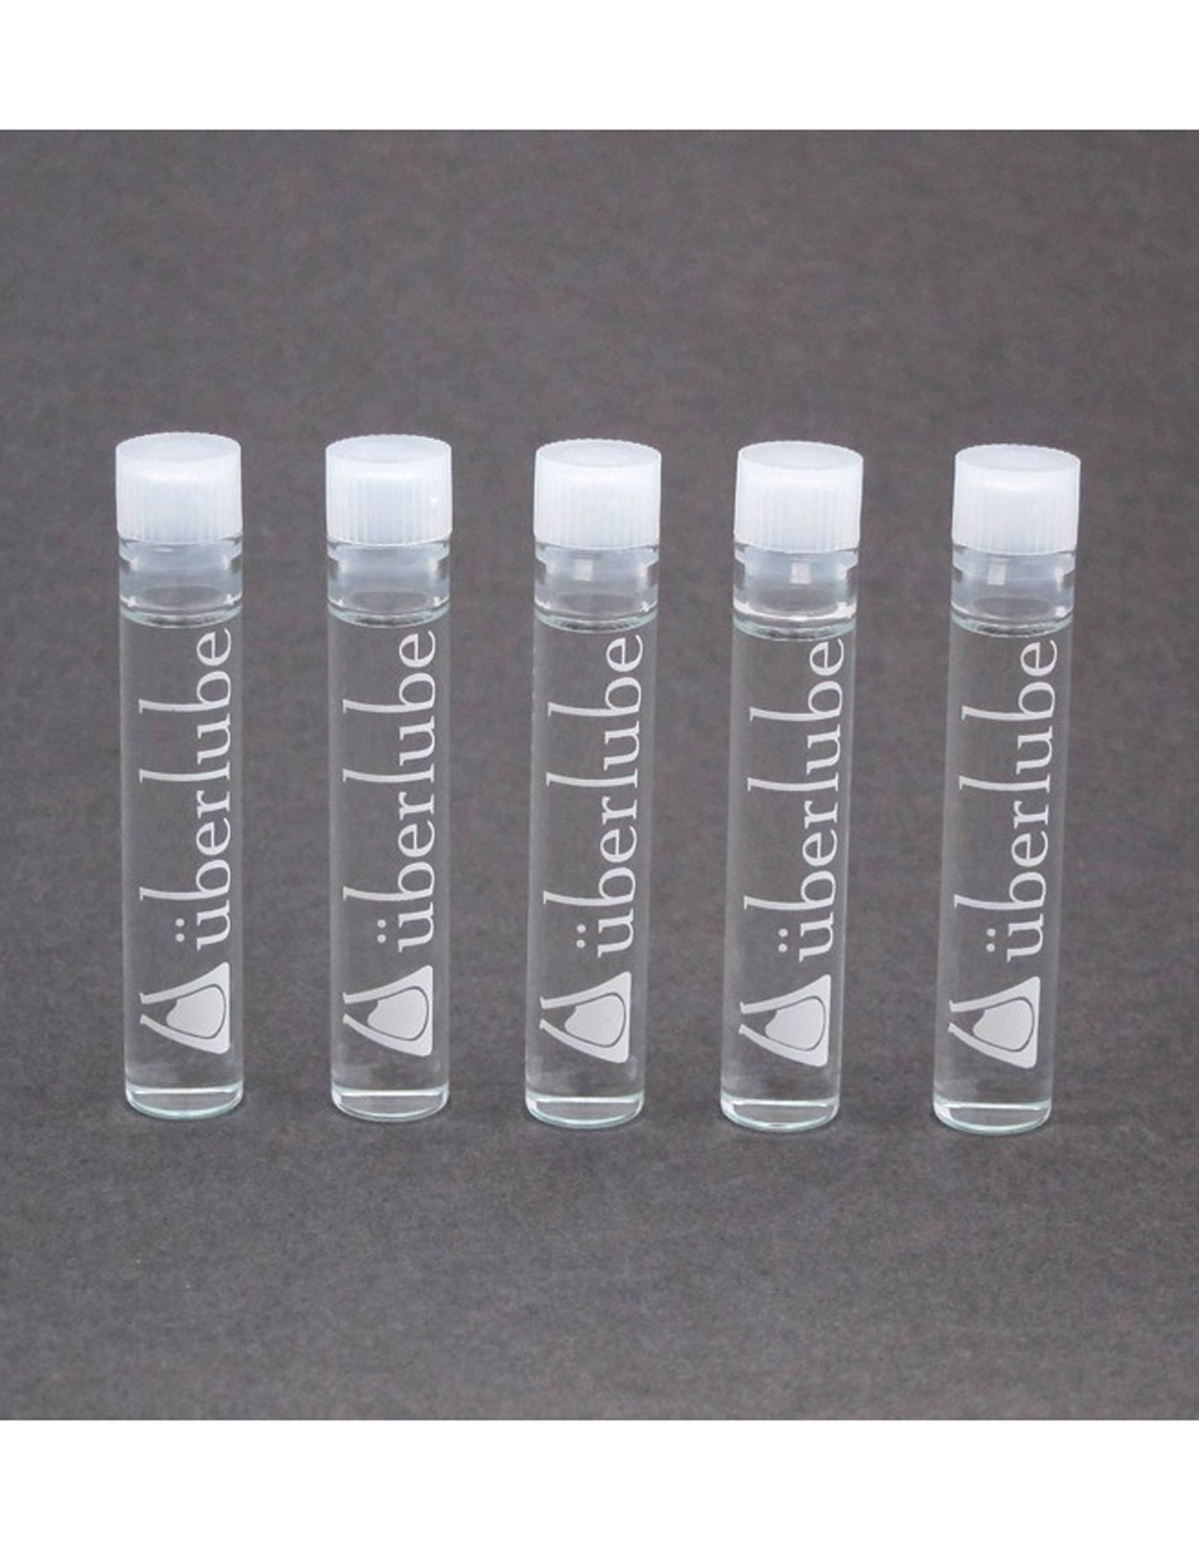 Uberlube Glass Vials Lubricant